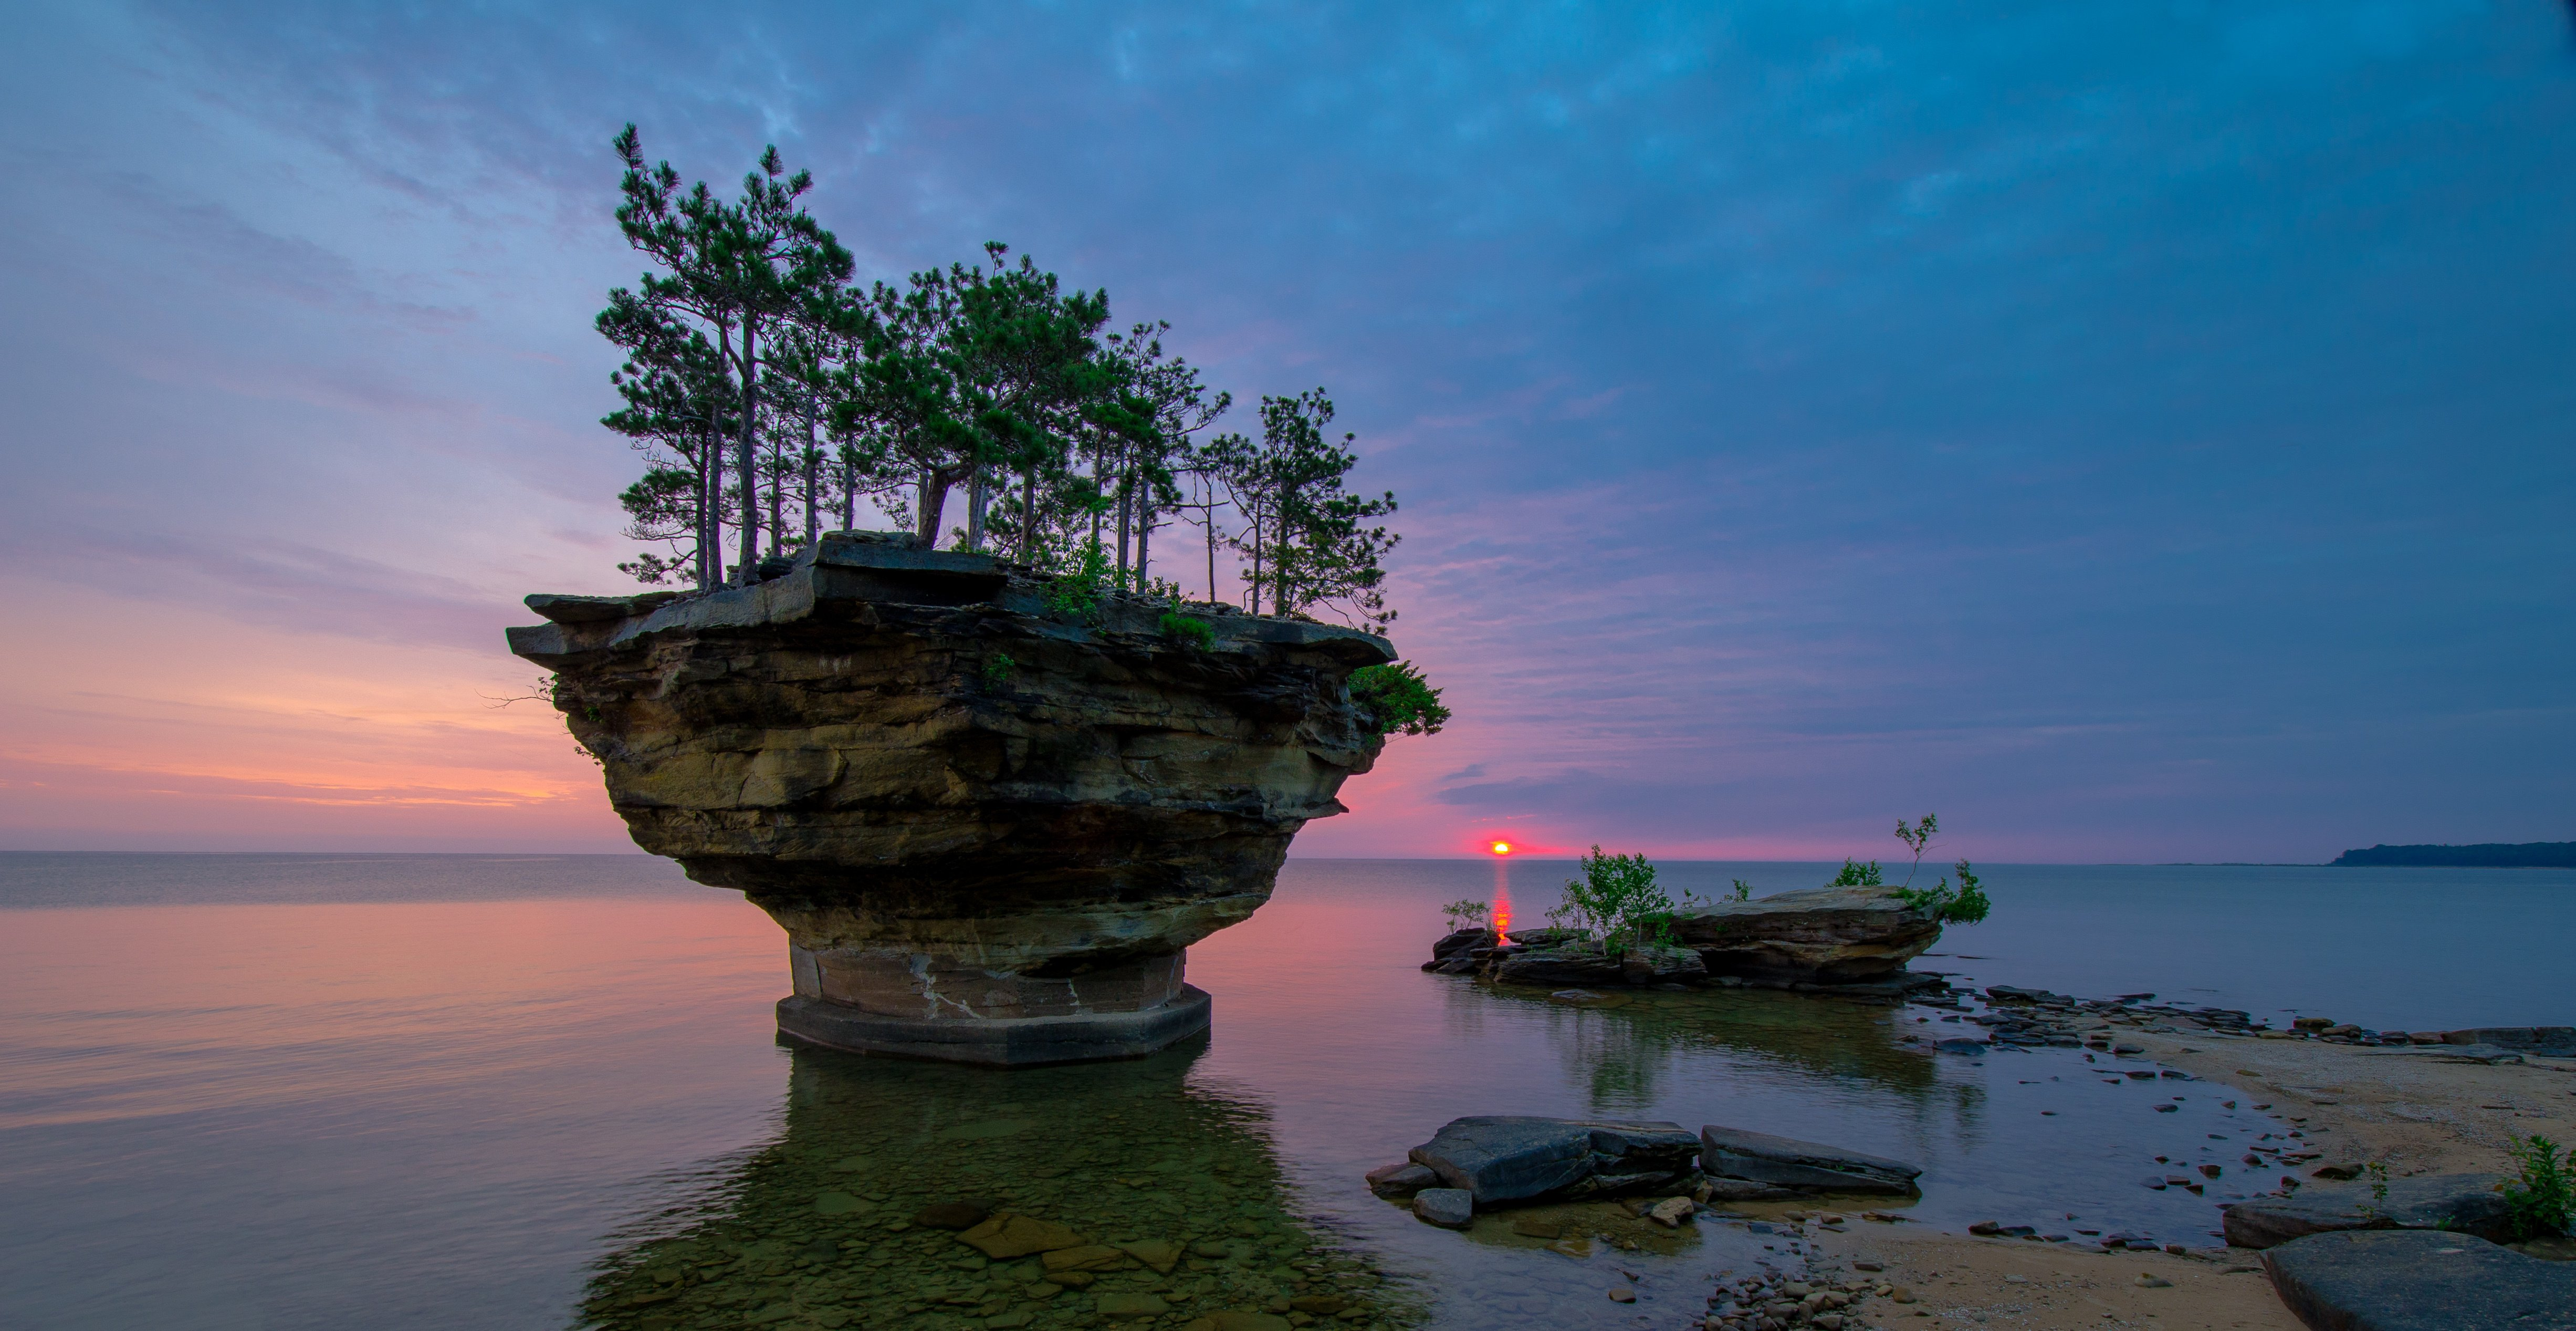 Michigan Lake Huron sunset rock trees landscape wallpaper 4906x2534 4906x2534